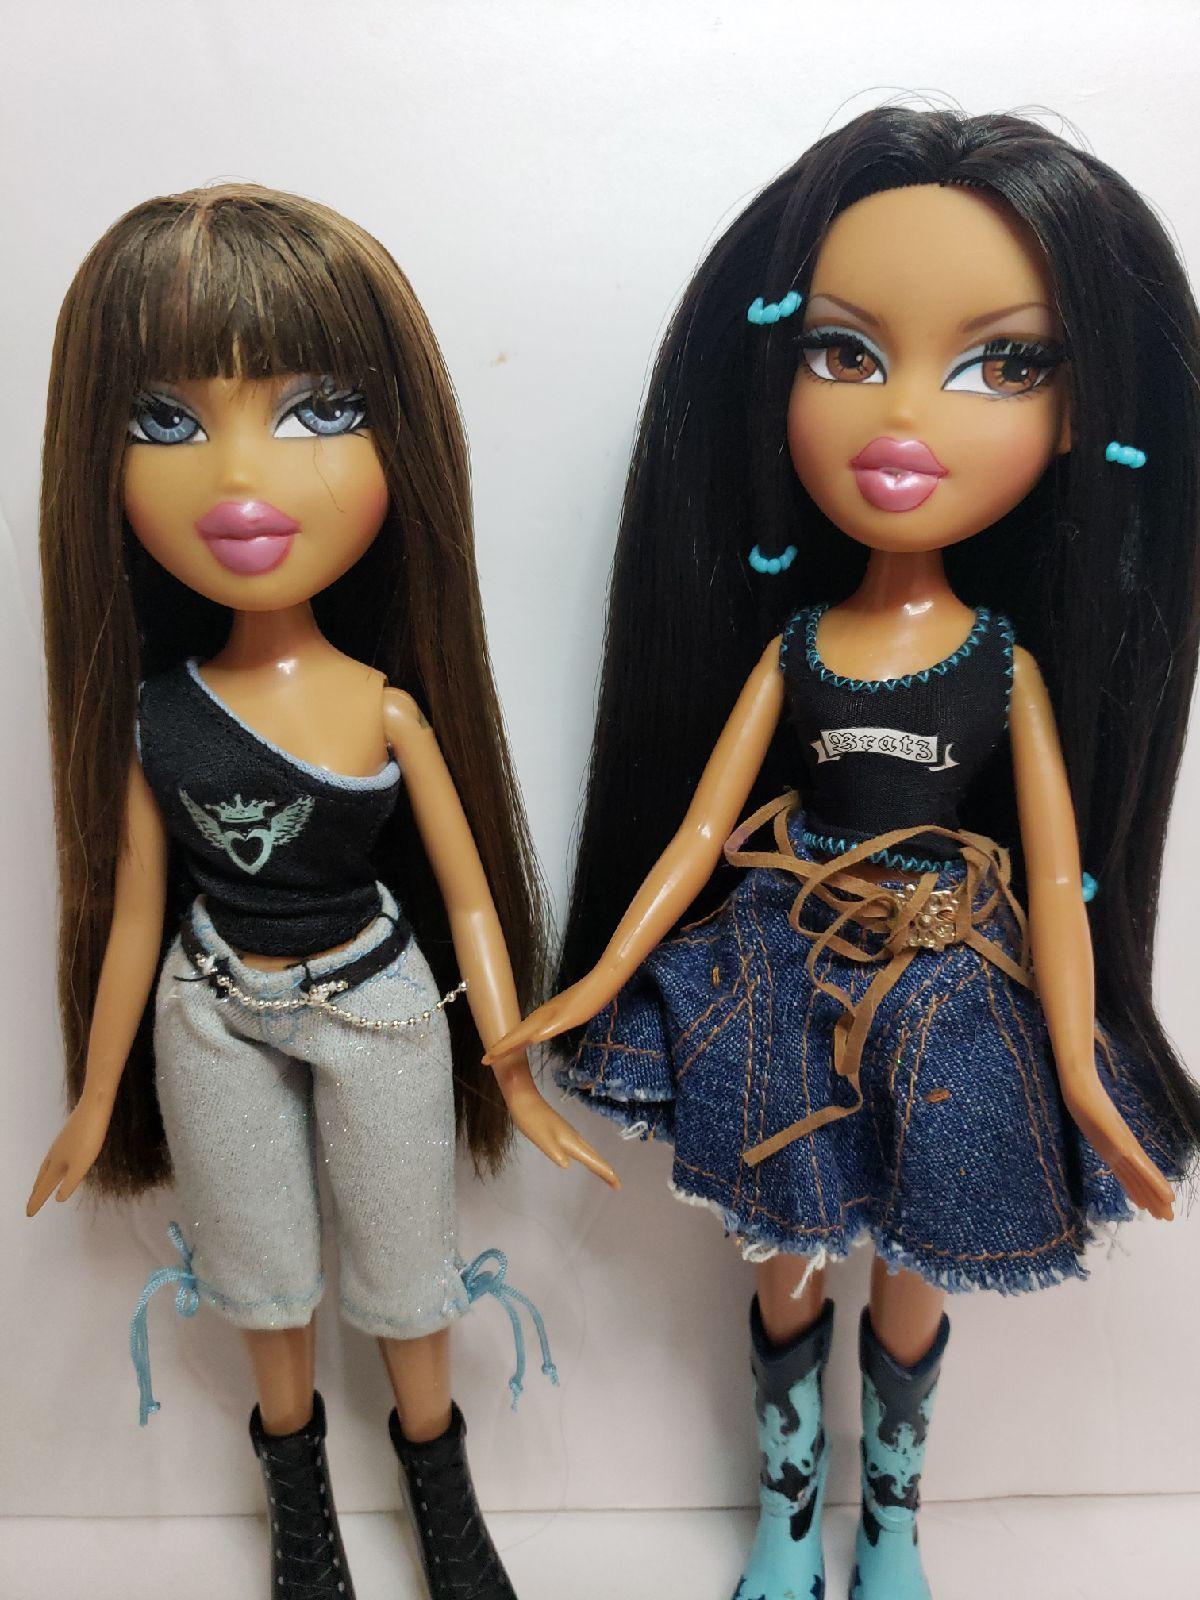 Pin on MGA Entertainment Fashion Dolls